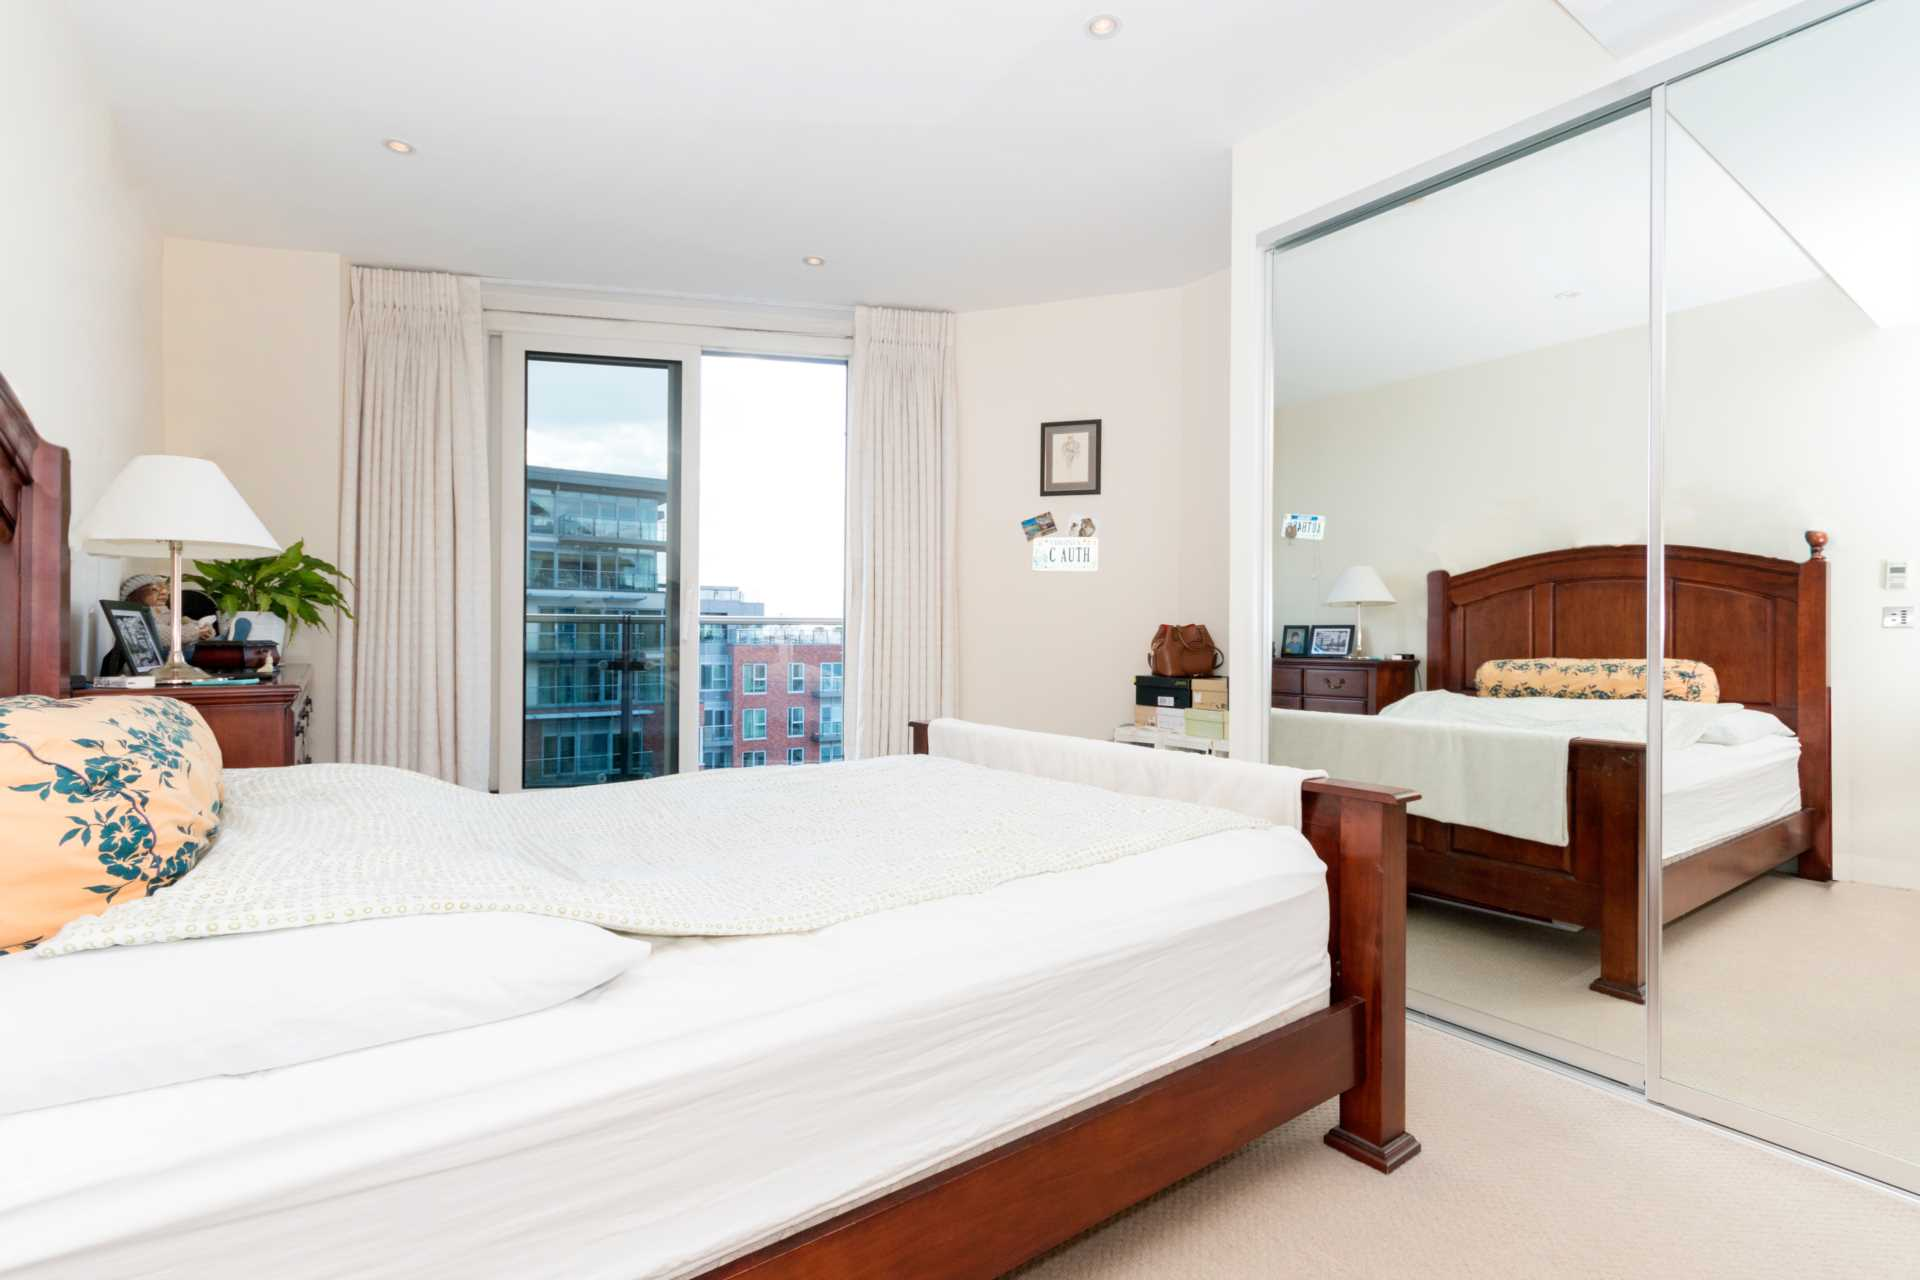 bedroom apartment to rent baltimore house juniper drive london